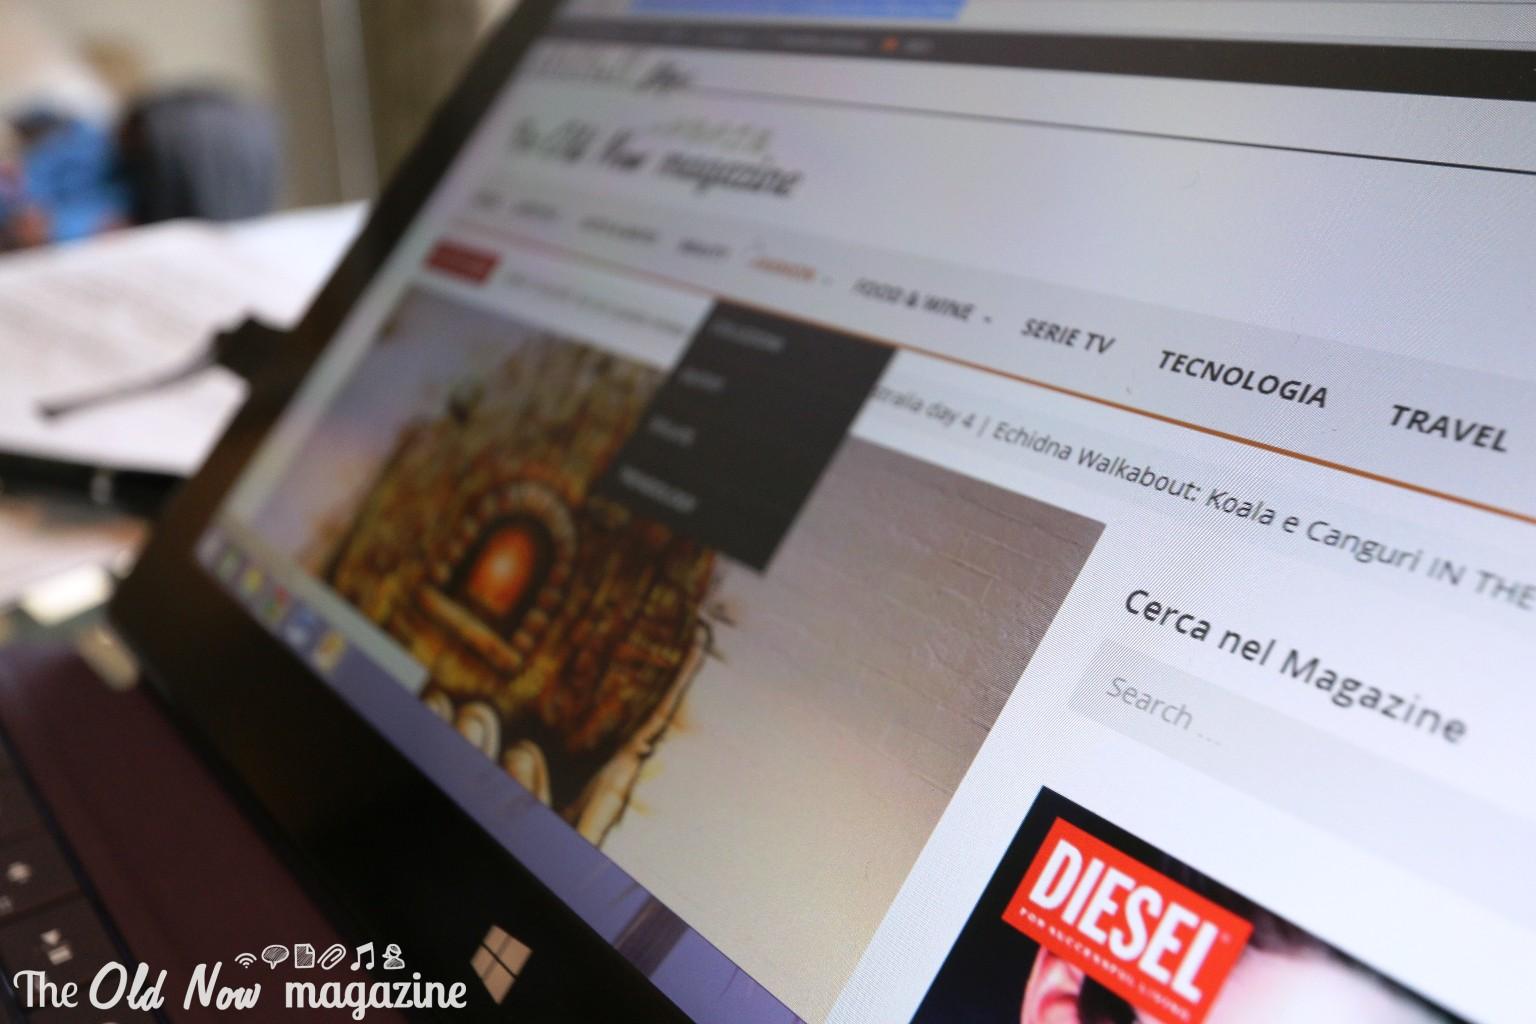 Microsoft Surface Pro 2  THEOLDNOW (3)